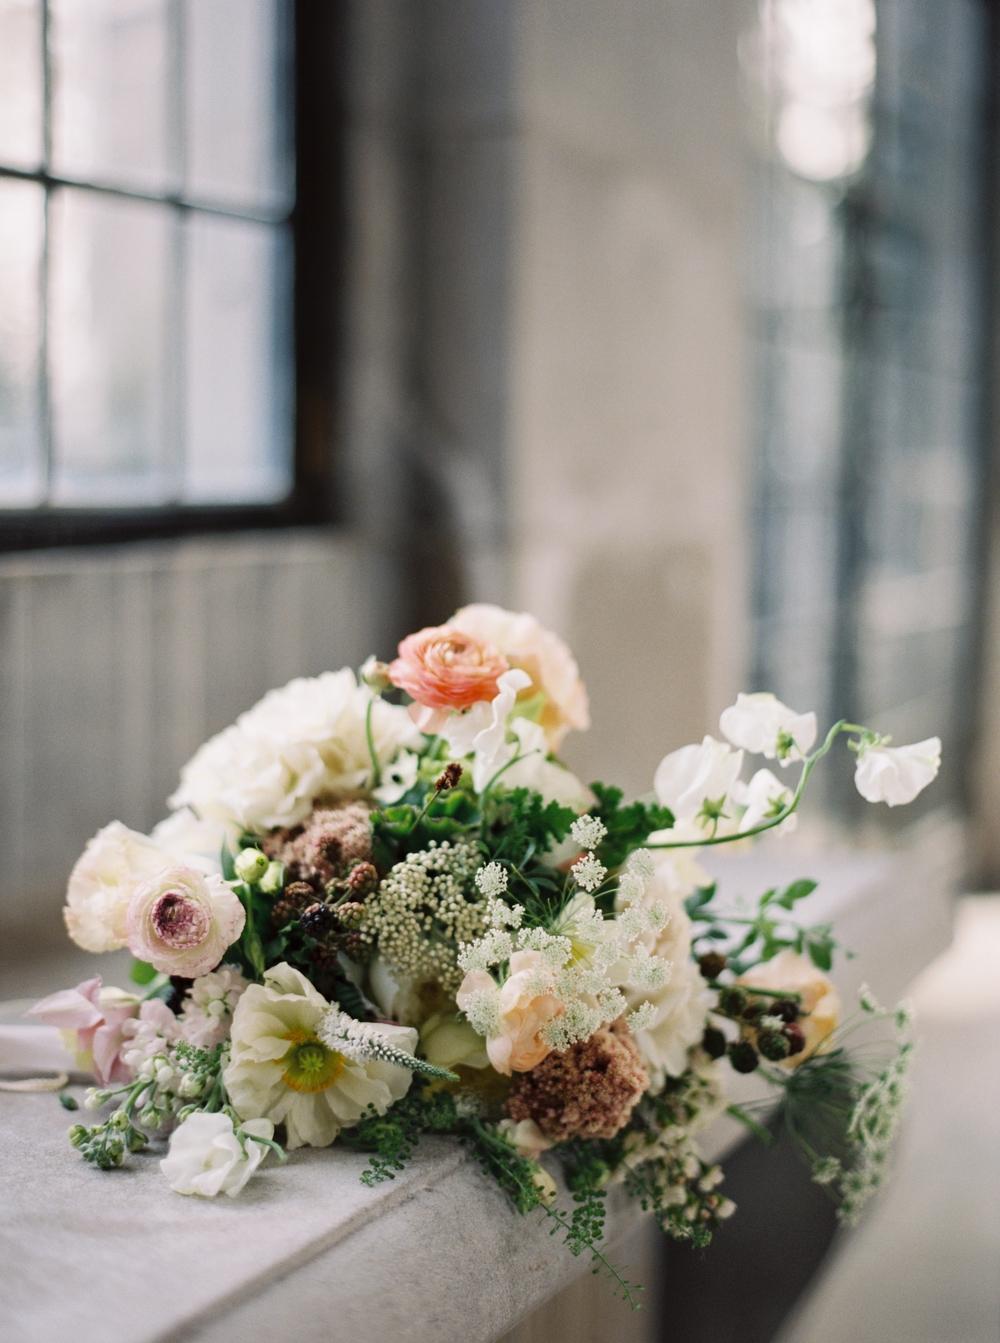 Kyle John l Fine Art Wedding Photography l Chicago, Copenhagen, California, New York, Destination l Blog l Kendahl_5